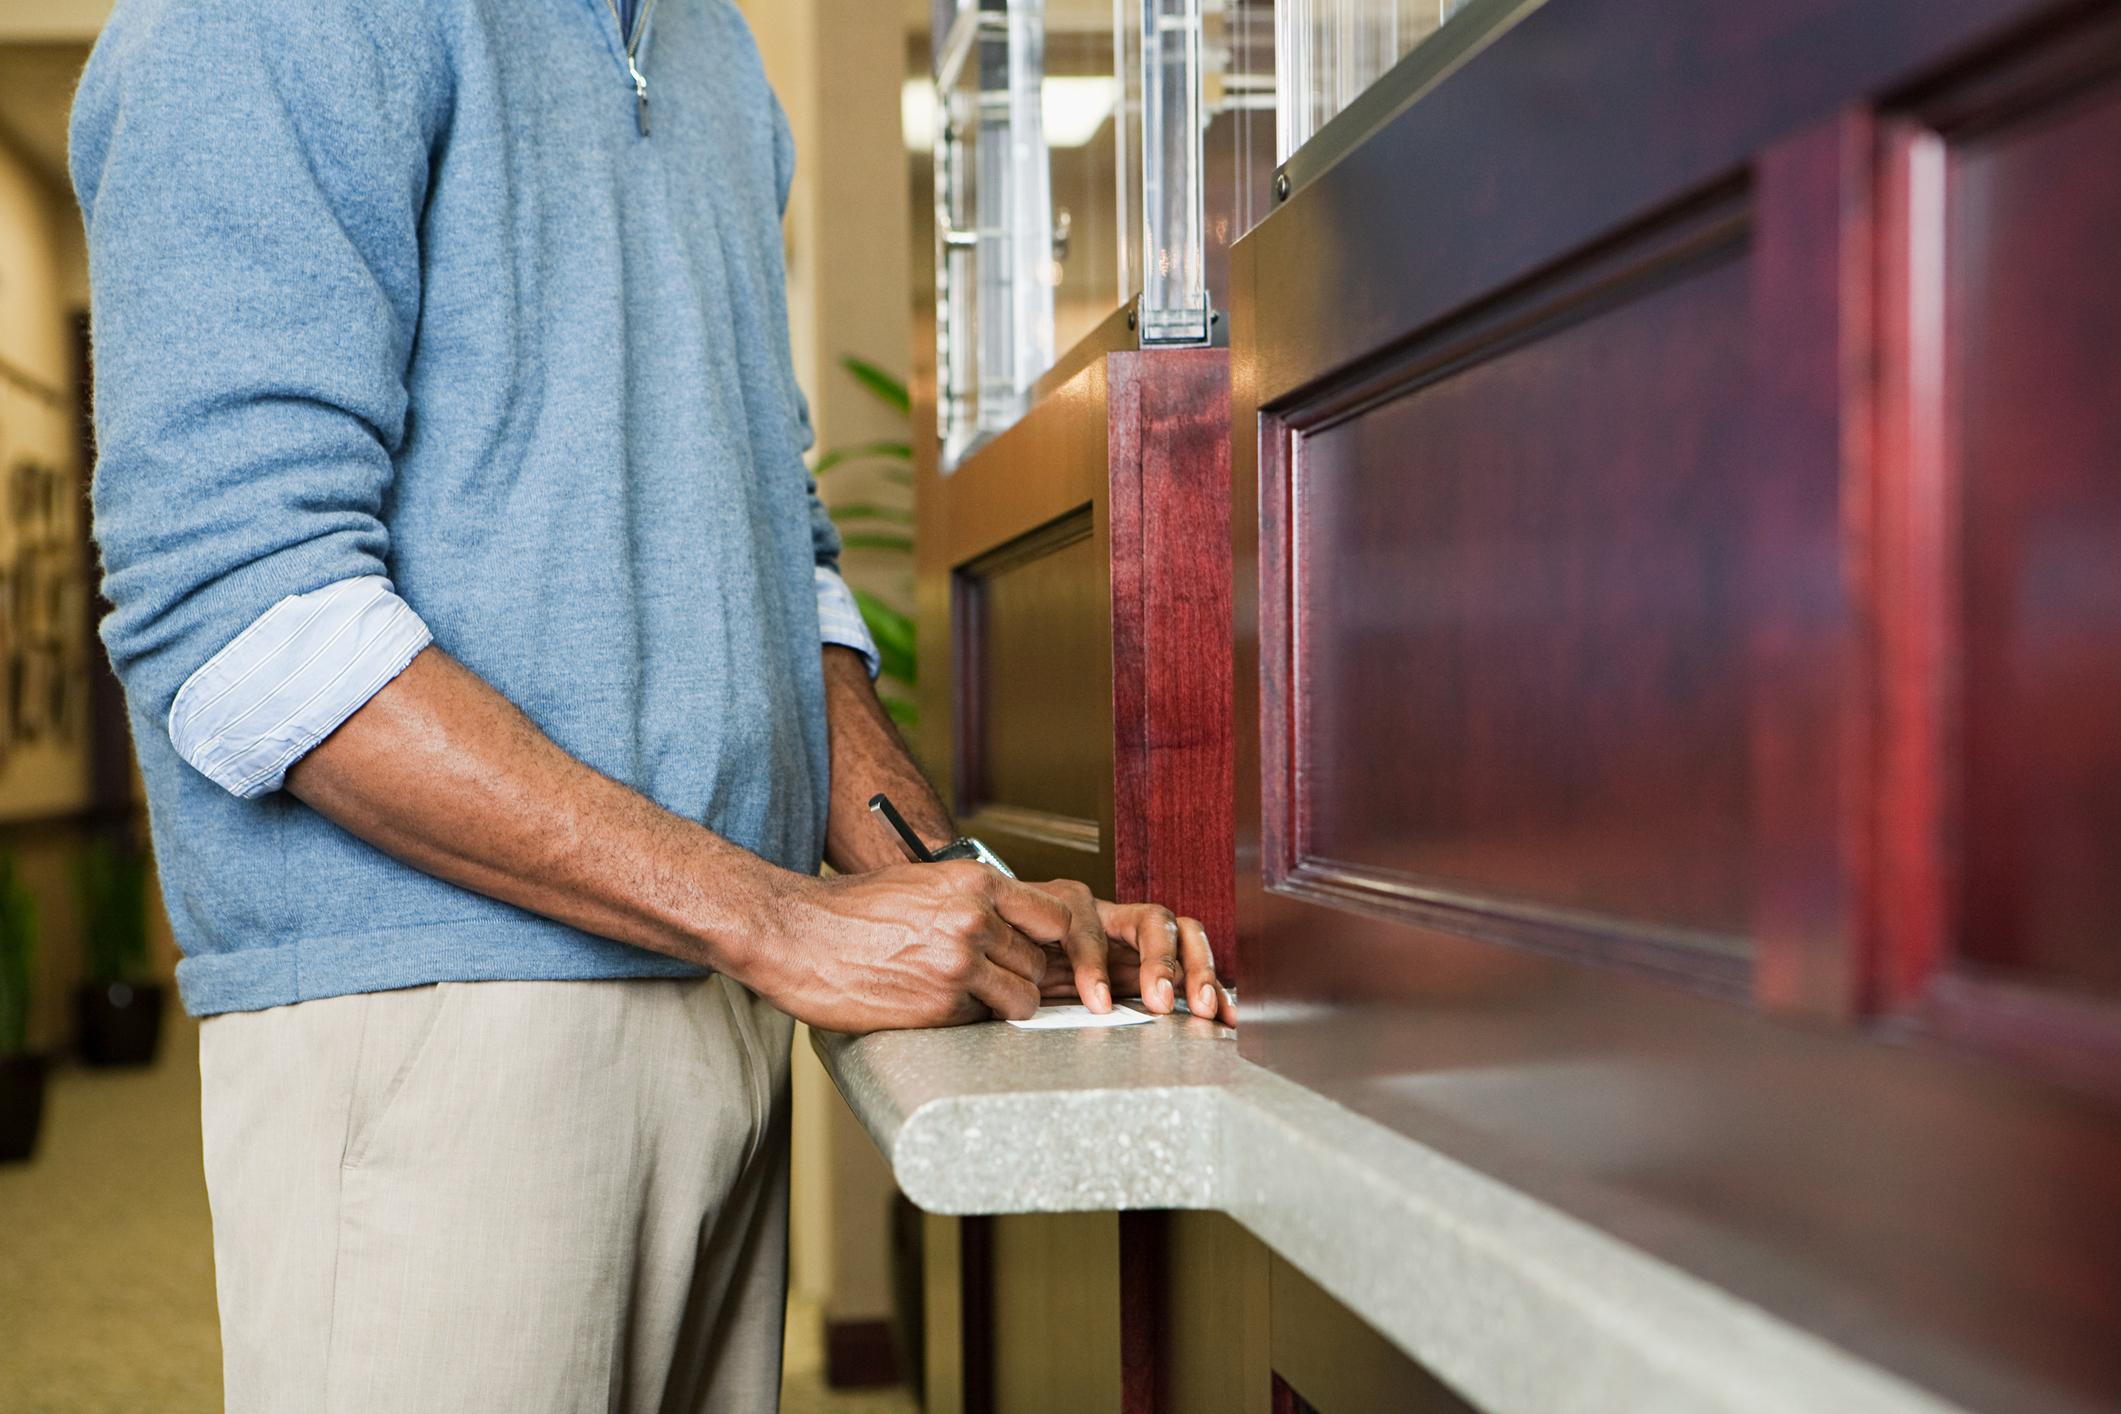 A bank customer filling out a deposit slip.